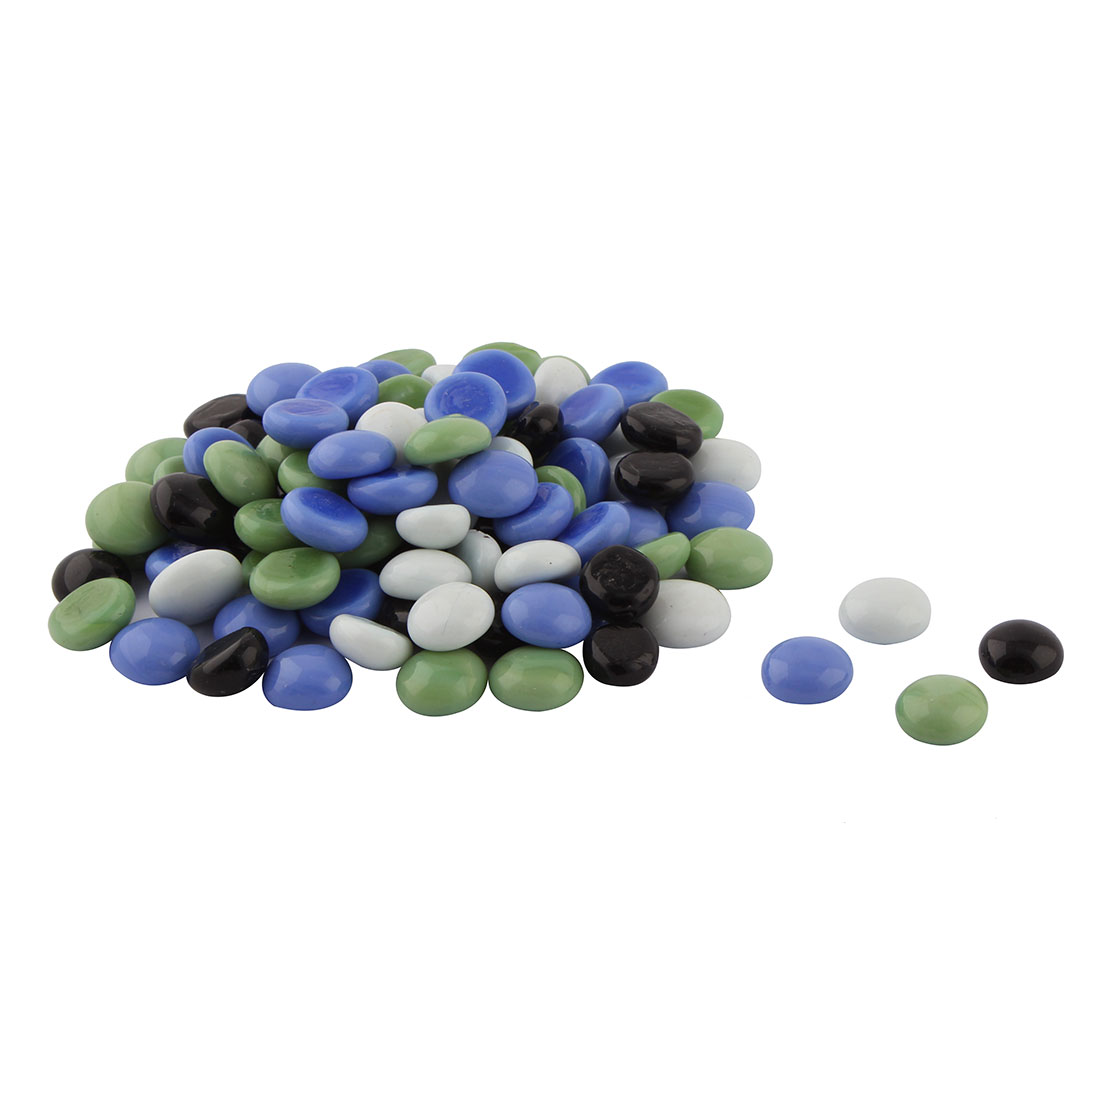 Fish Tank Aquarium Plant Pot Glass Round Shaped Decorative Stone Ornament 100pcs